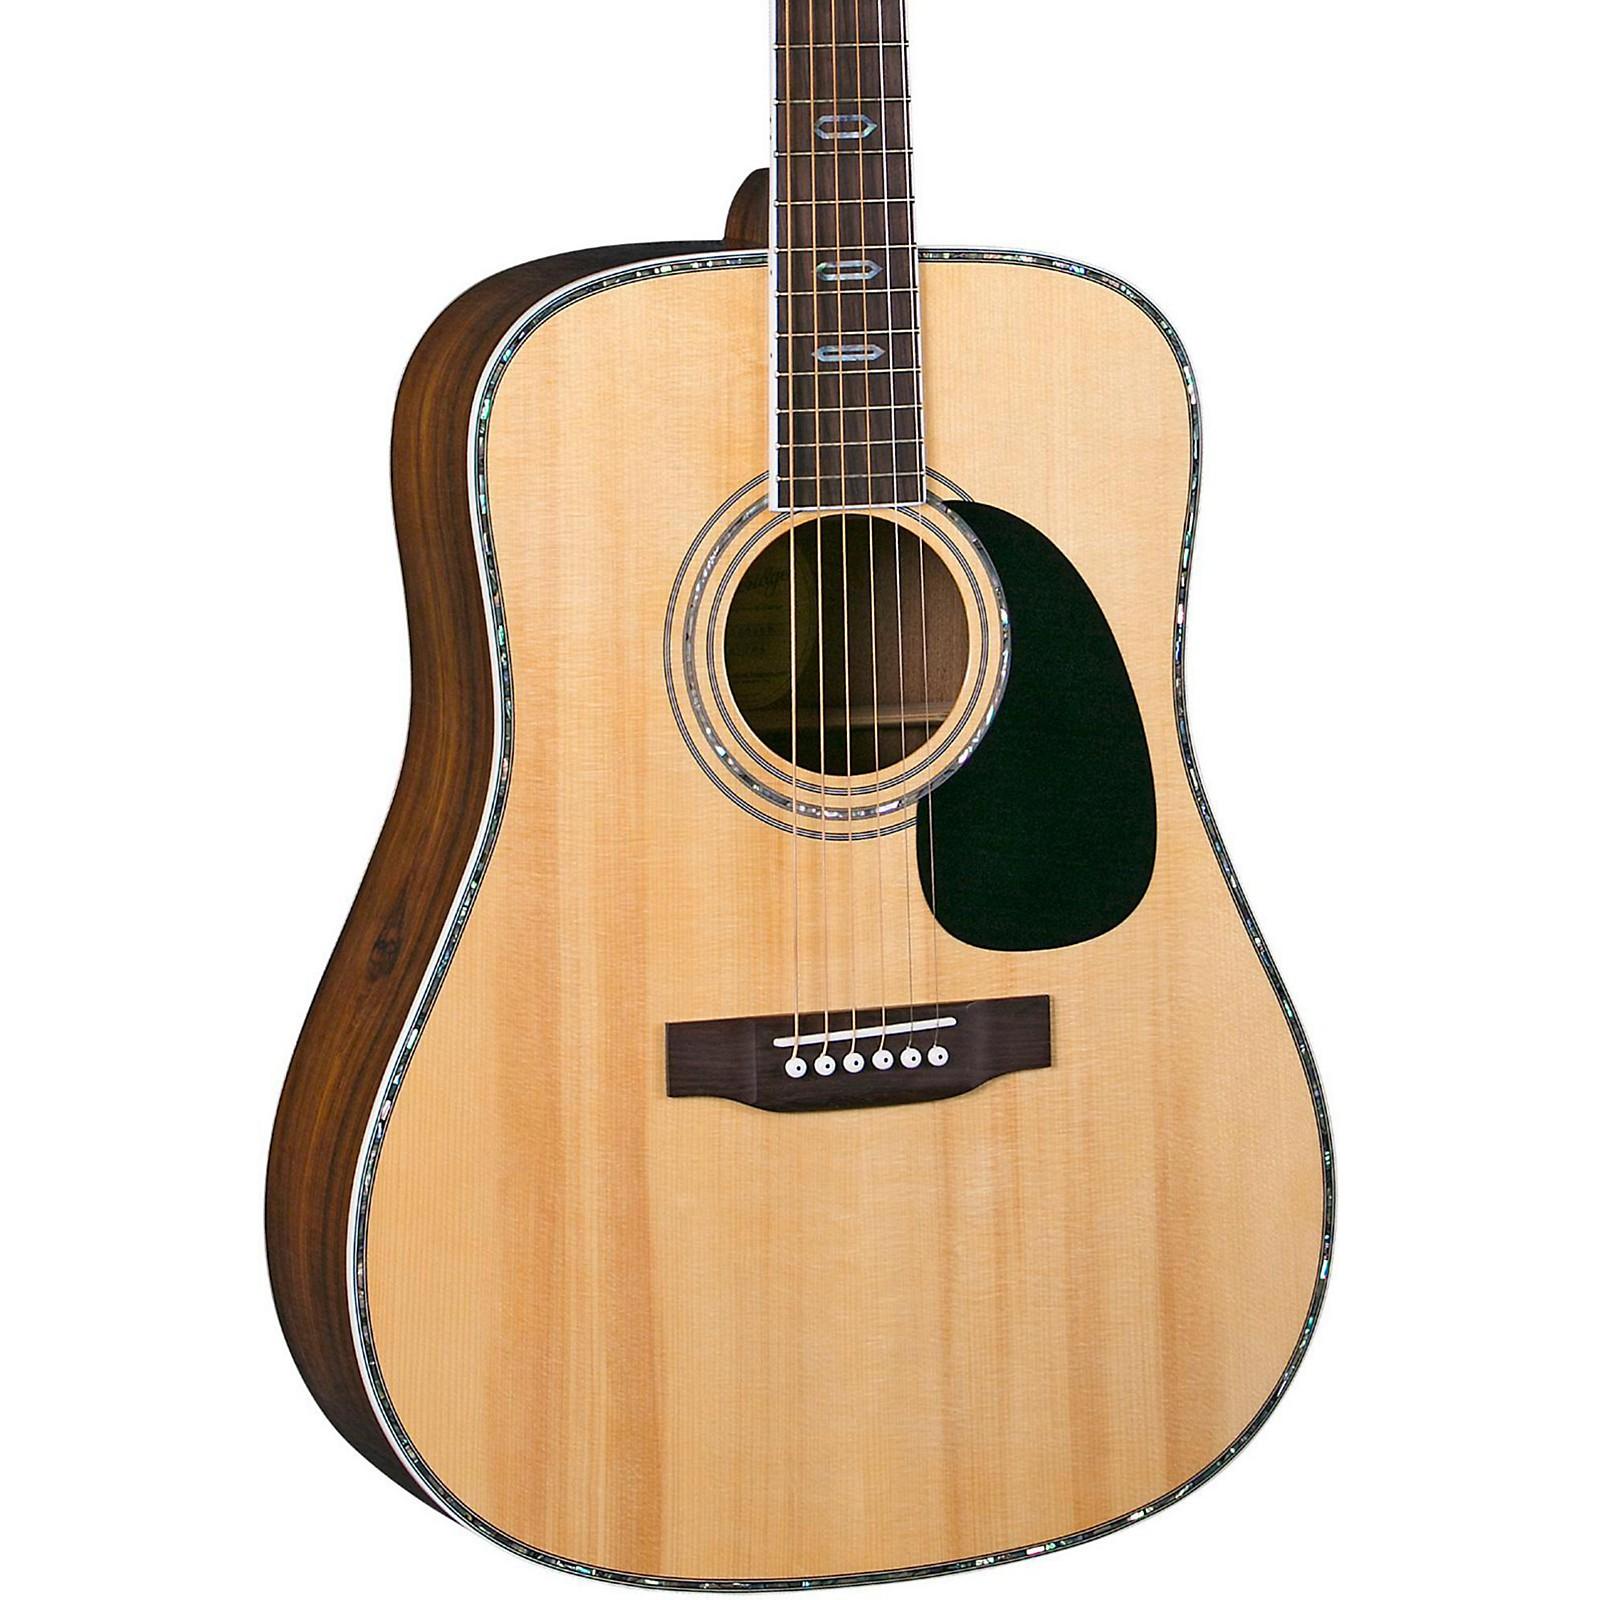 Blueridge Contemporary Series BR-70A Dreadnought Acoustic Guitar